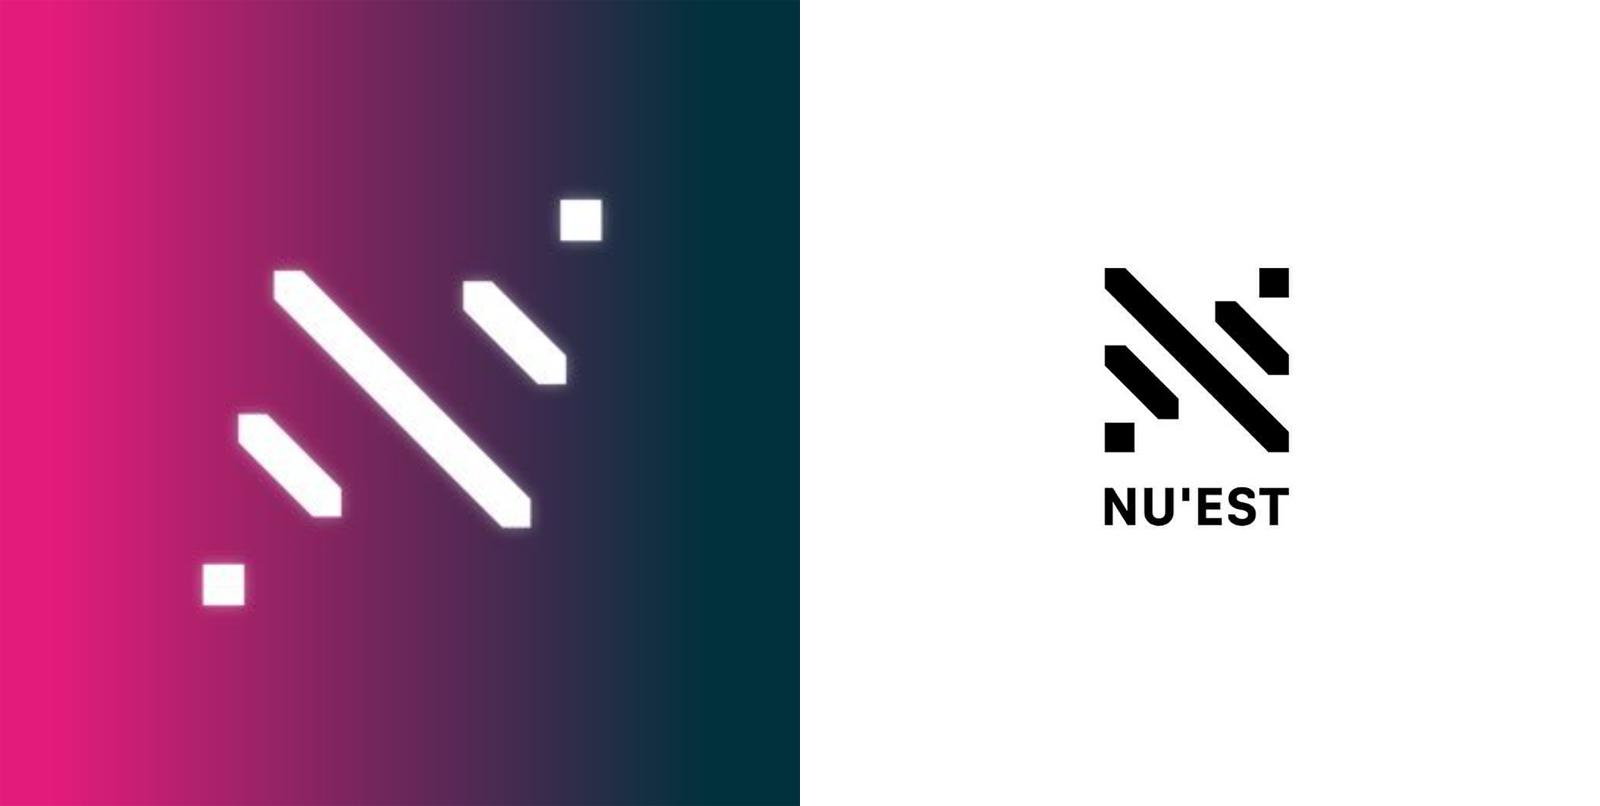 nu'est twitter logos